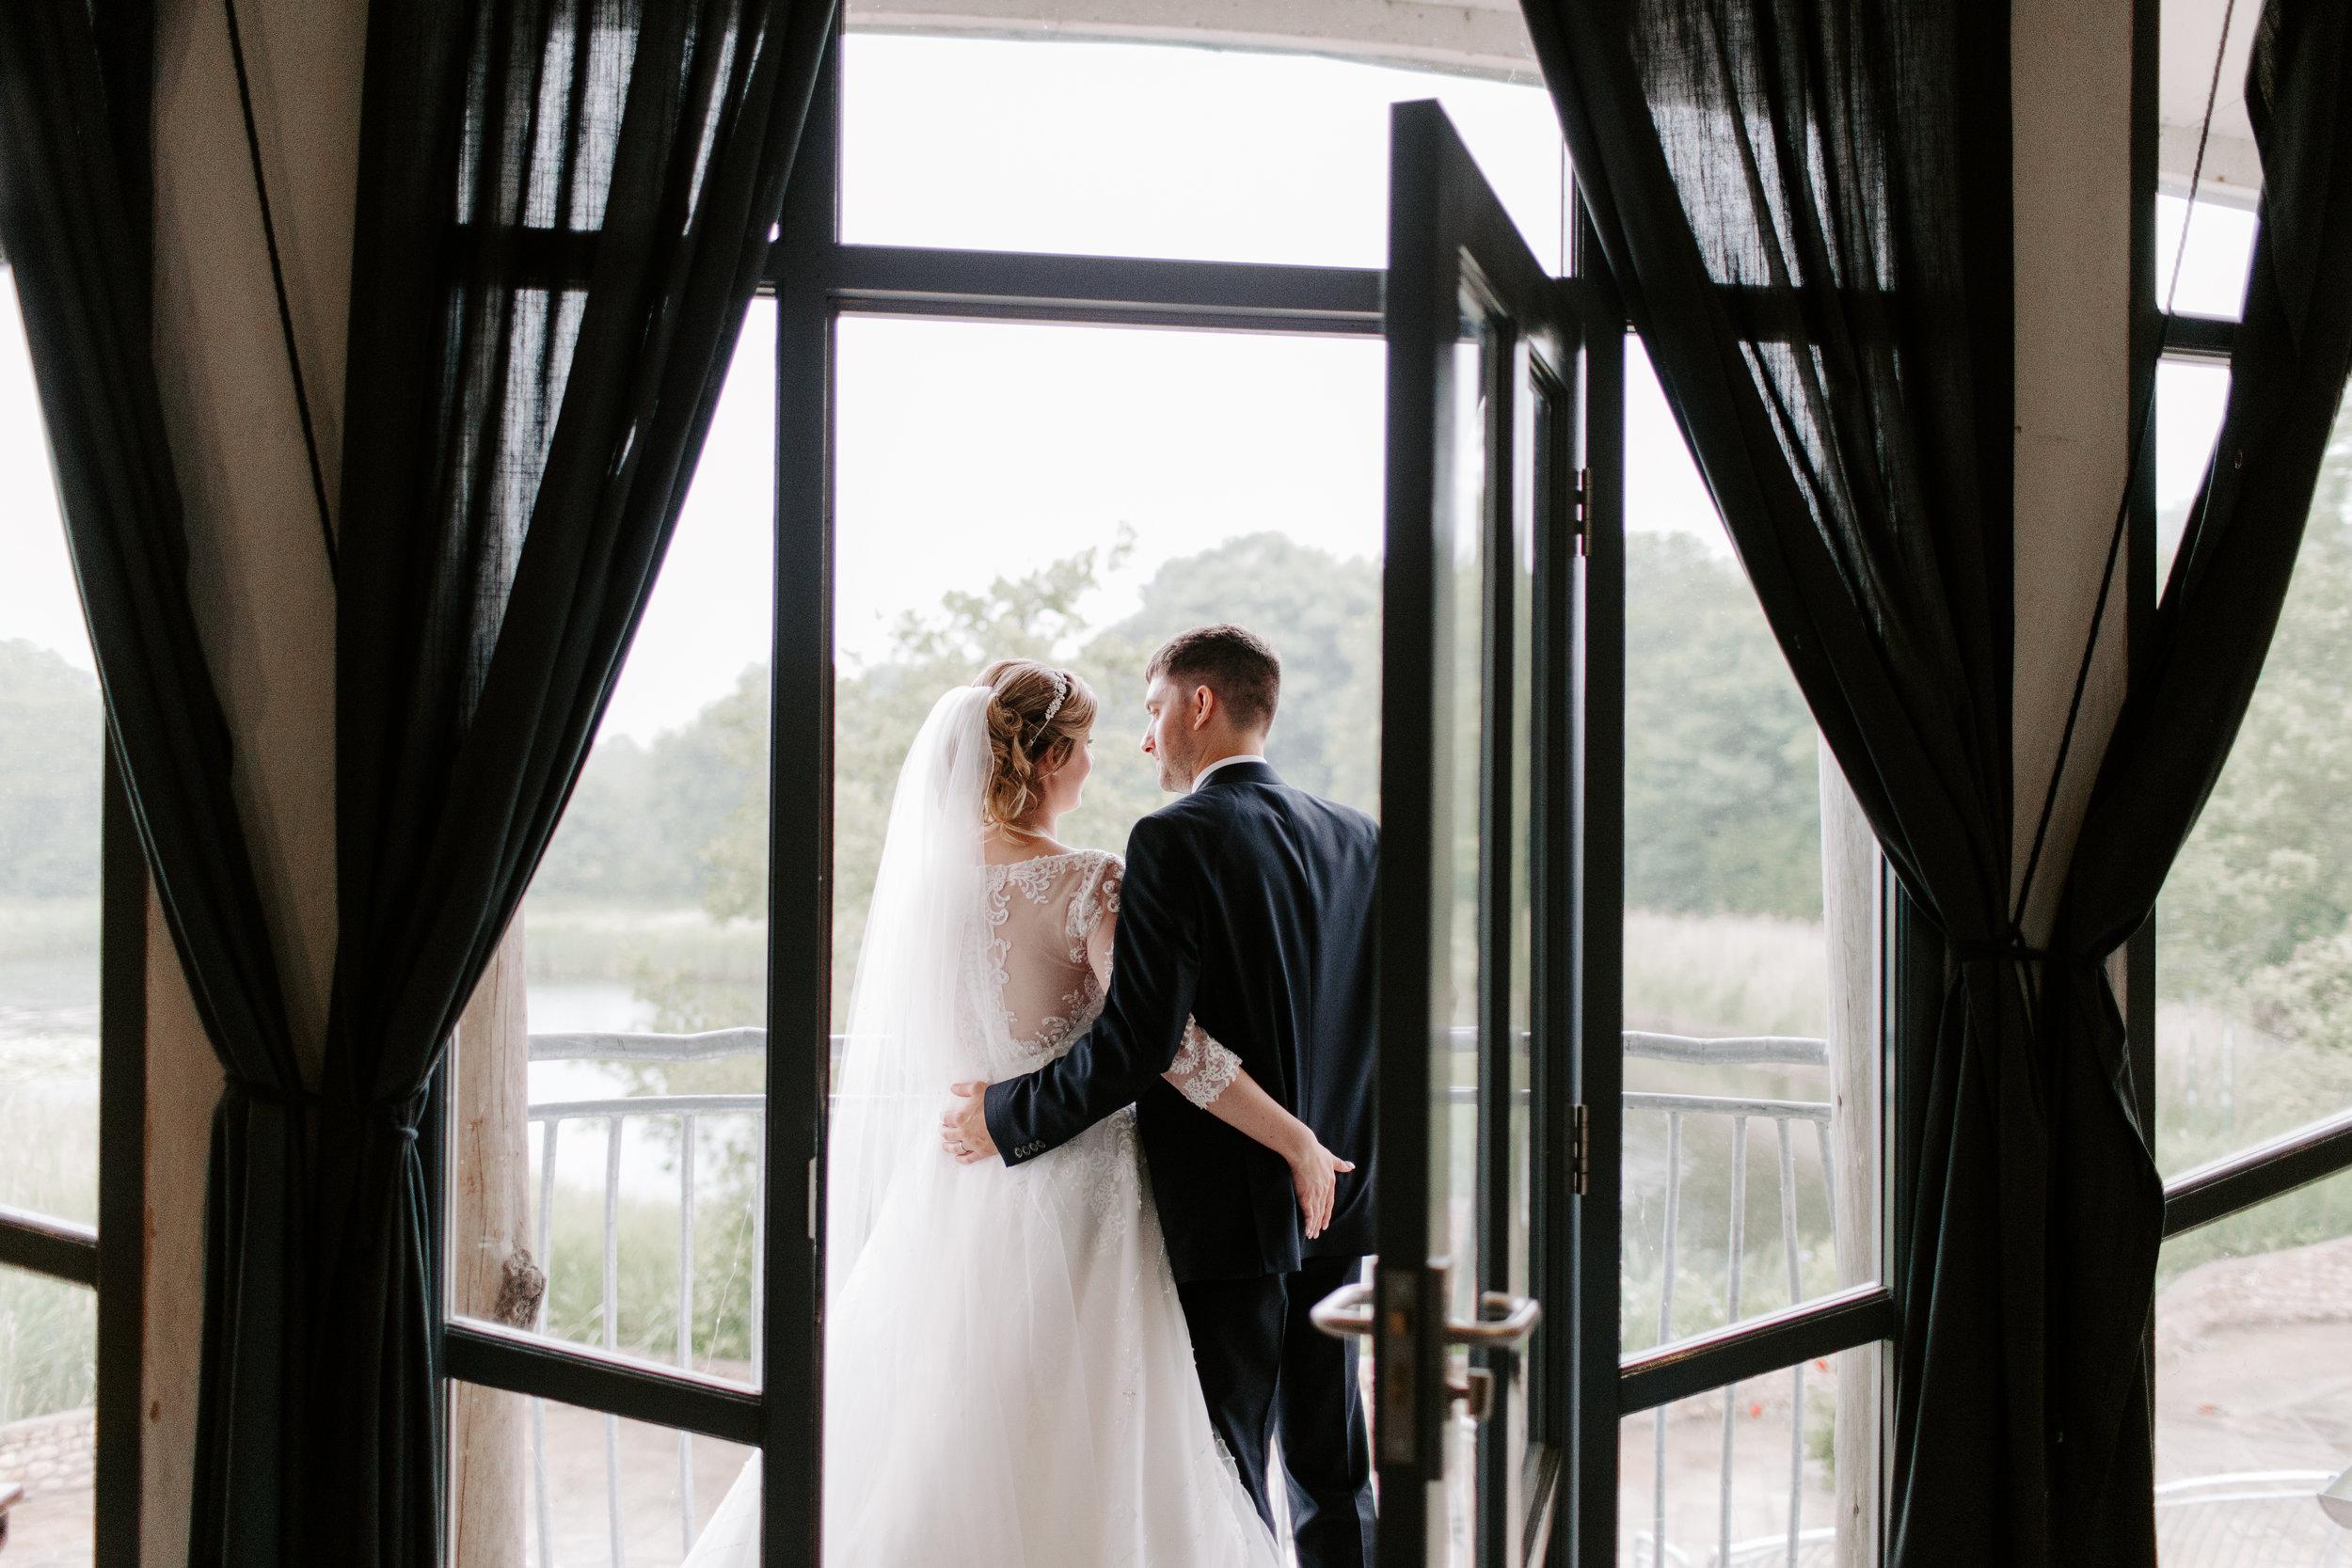 wedding-portaits.jpg